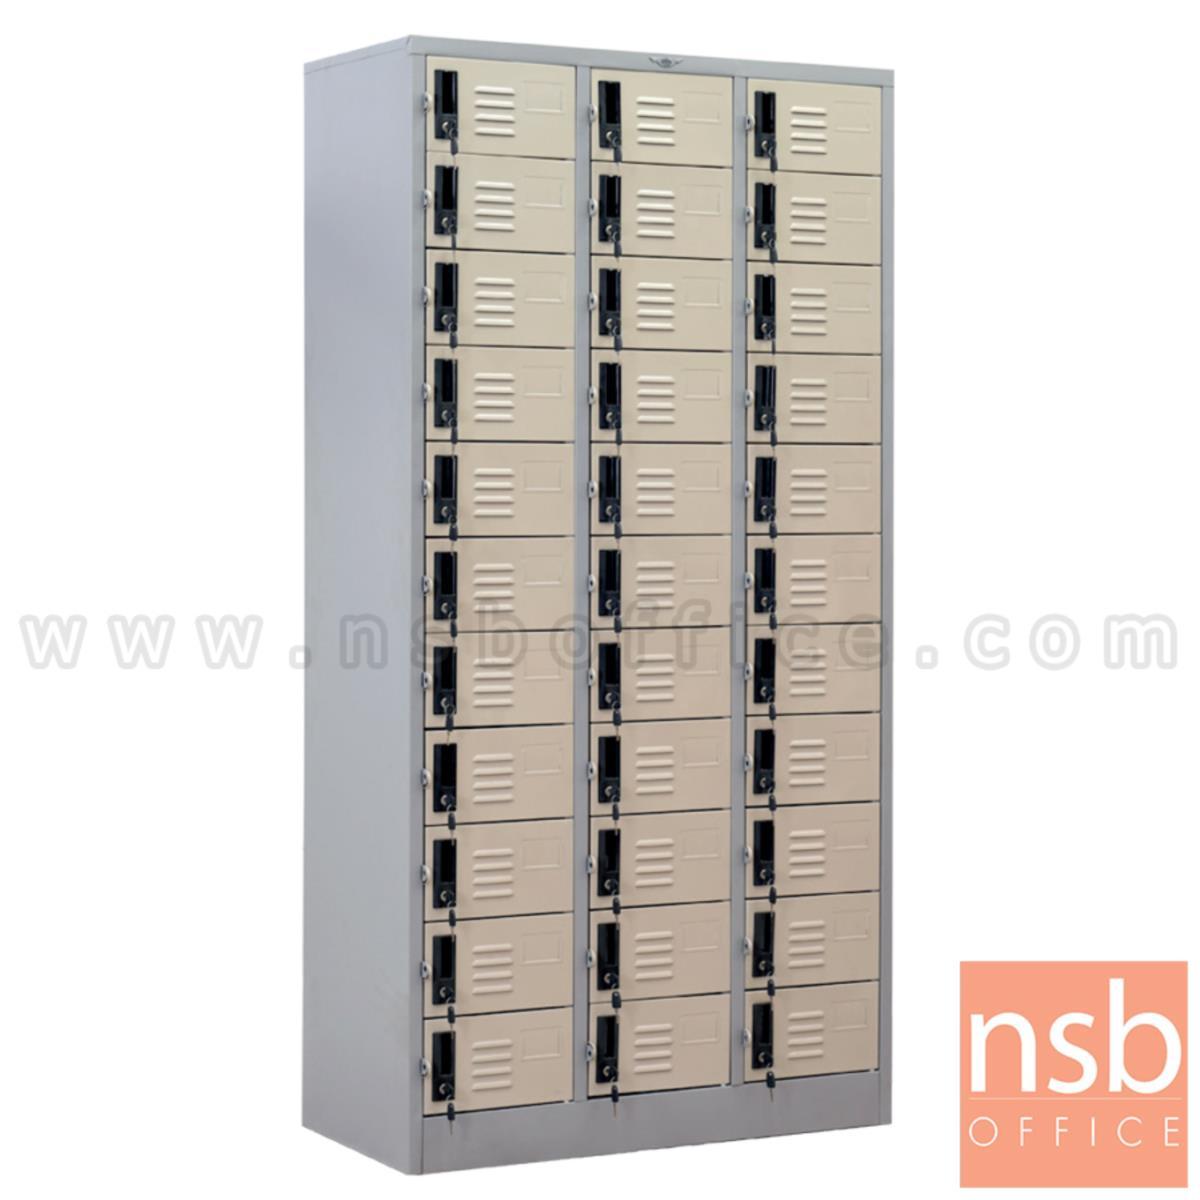 E03A055:ตู้ล็อกเกอร์ 33 ประตู รุ่น Estee (เอสเต้) ขนาด 91.4W*183H cm.